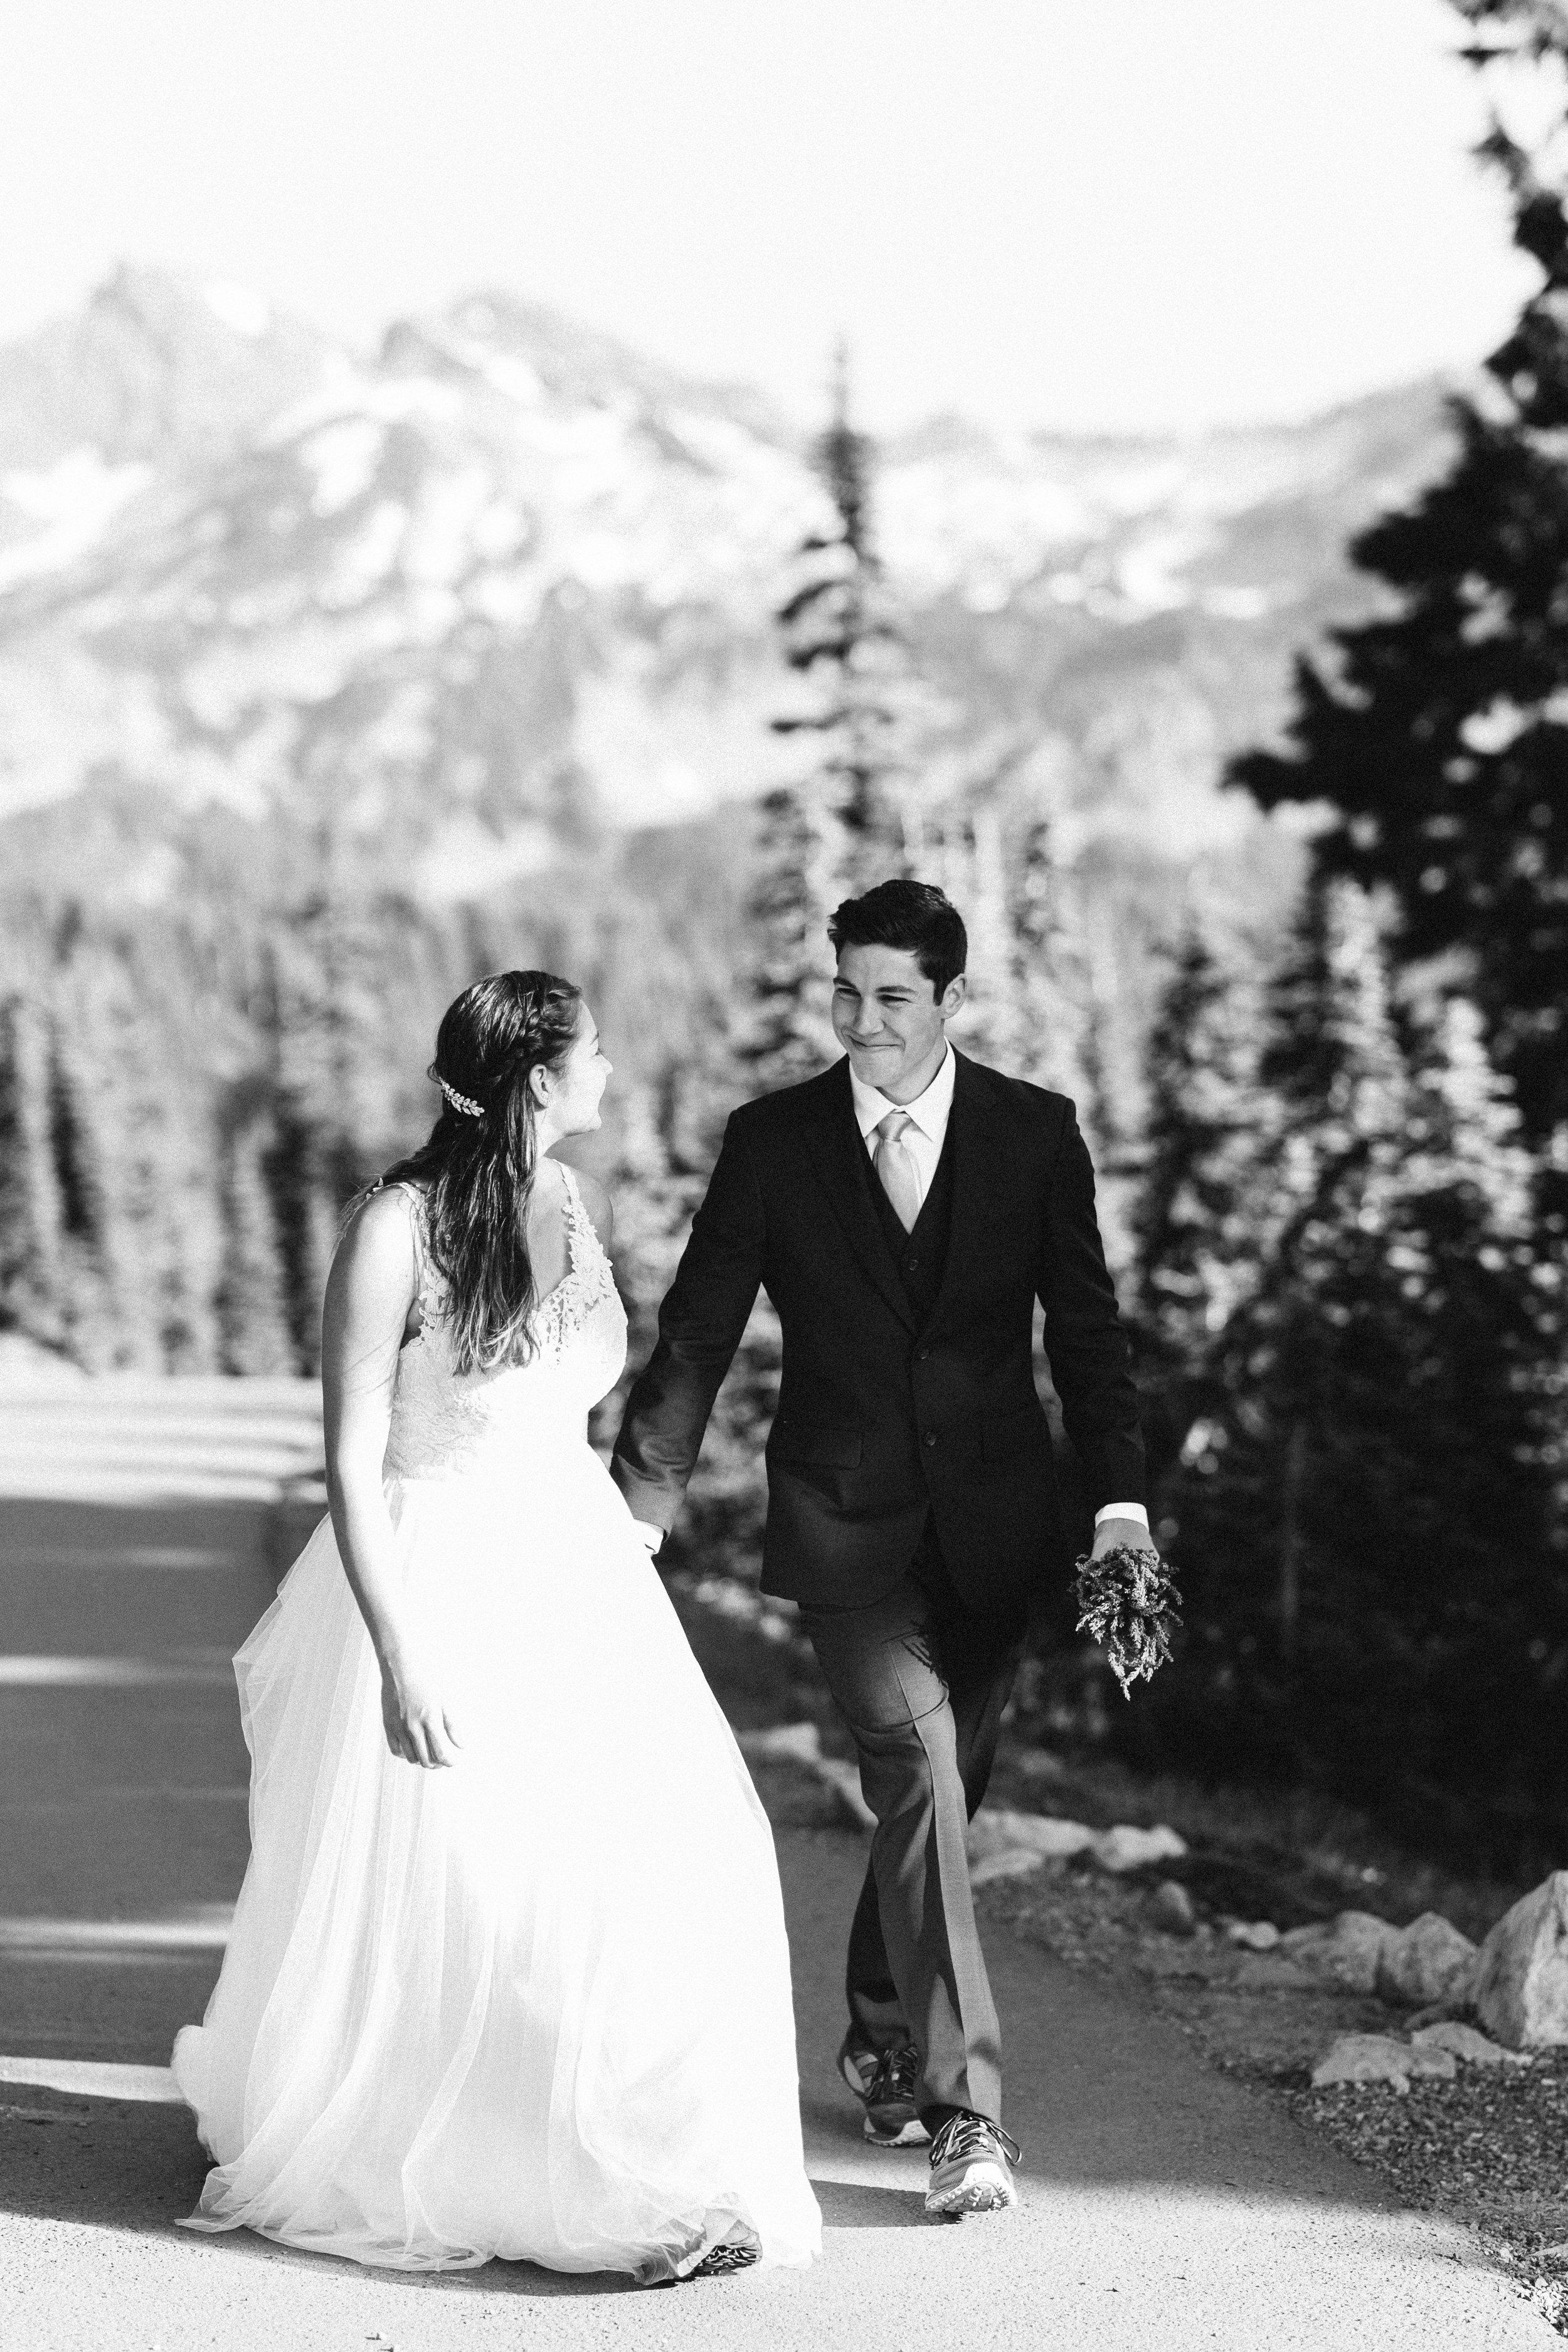 Nicole-Daacke-Photography-Mt-Rainier-elopement-photographer-washington-mountain-epic-wedding-photography-wildflowers-at-rainier-pine-tree-cloudy-summer-day-at-mountain-rainier-4.jpg